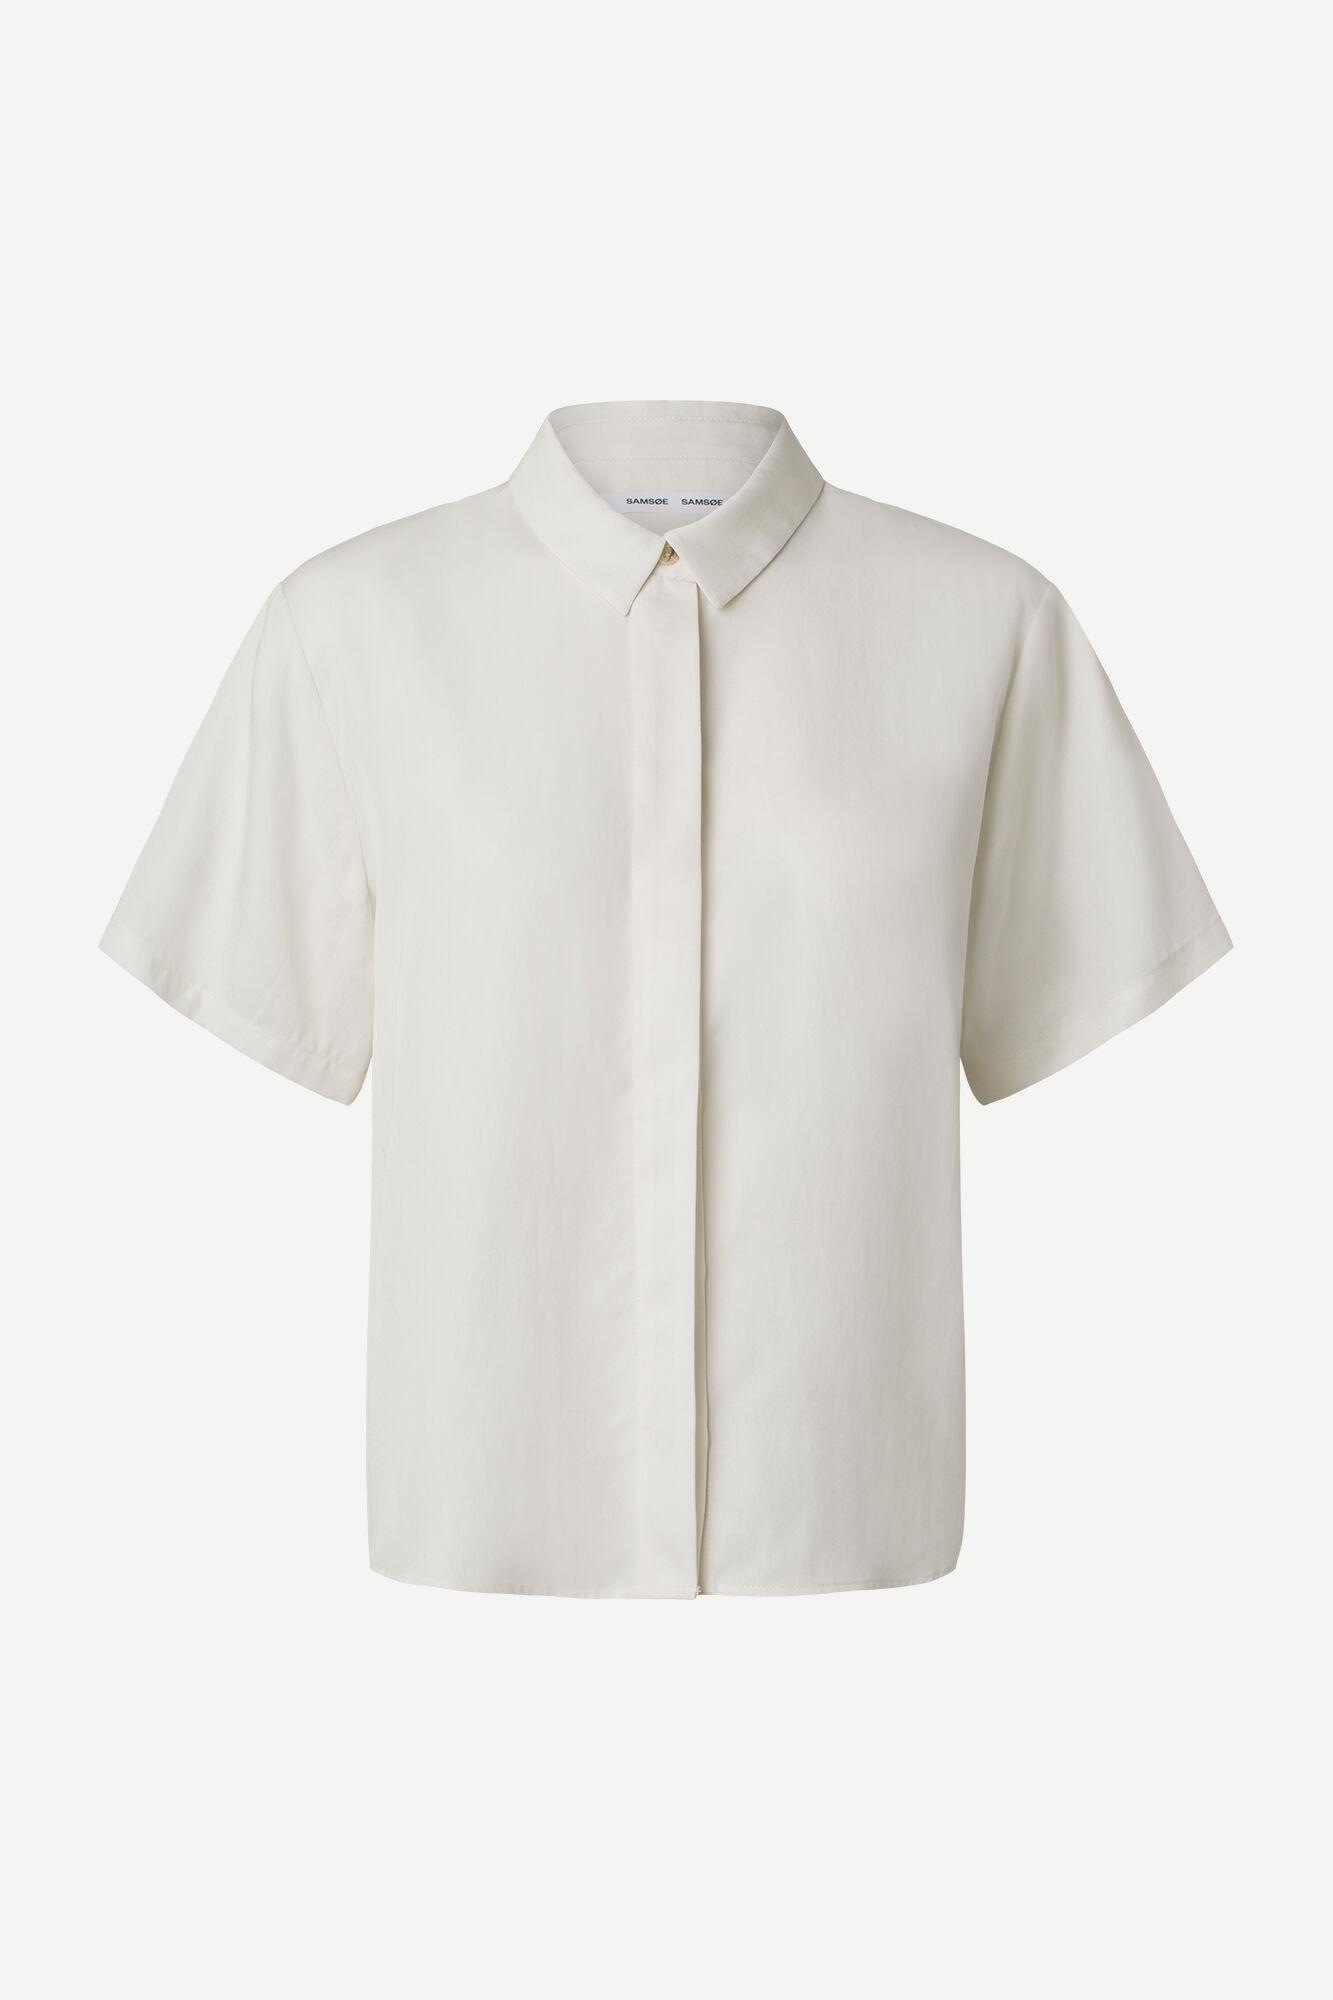 Mina ss shirt 14028, ANTIQUE WHITE